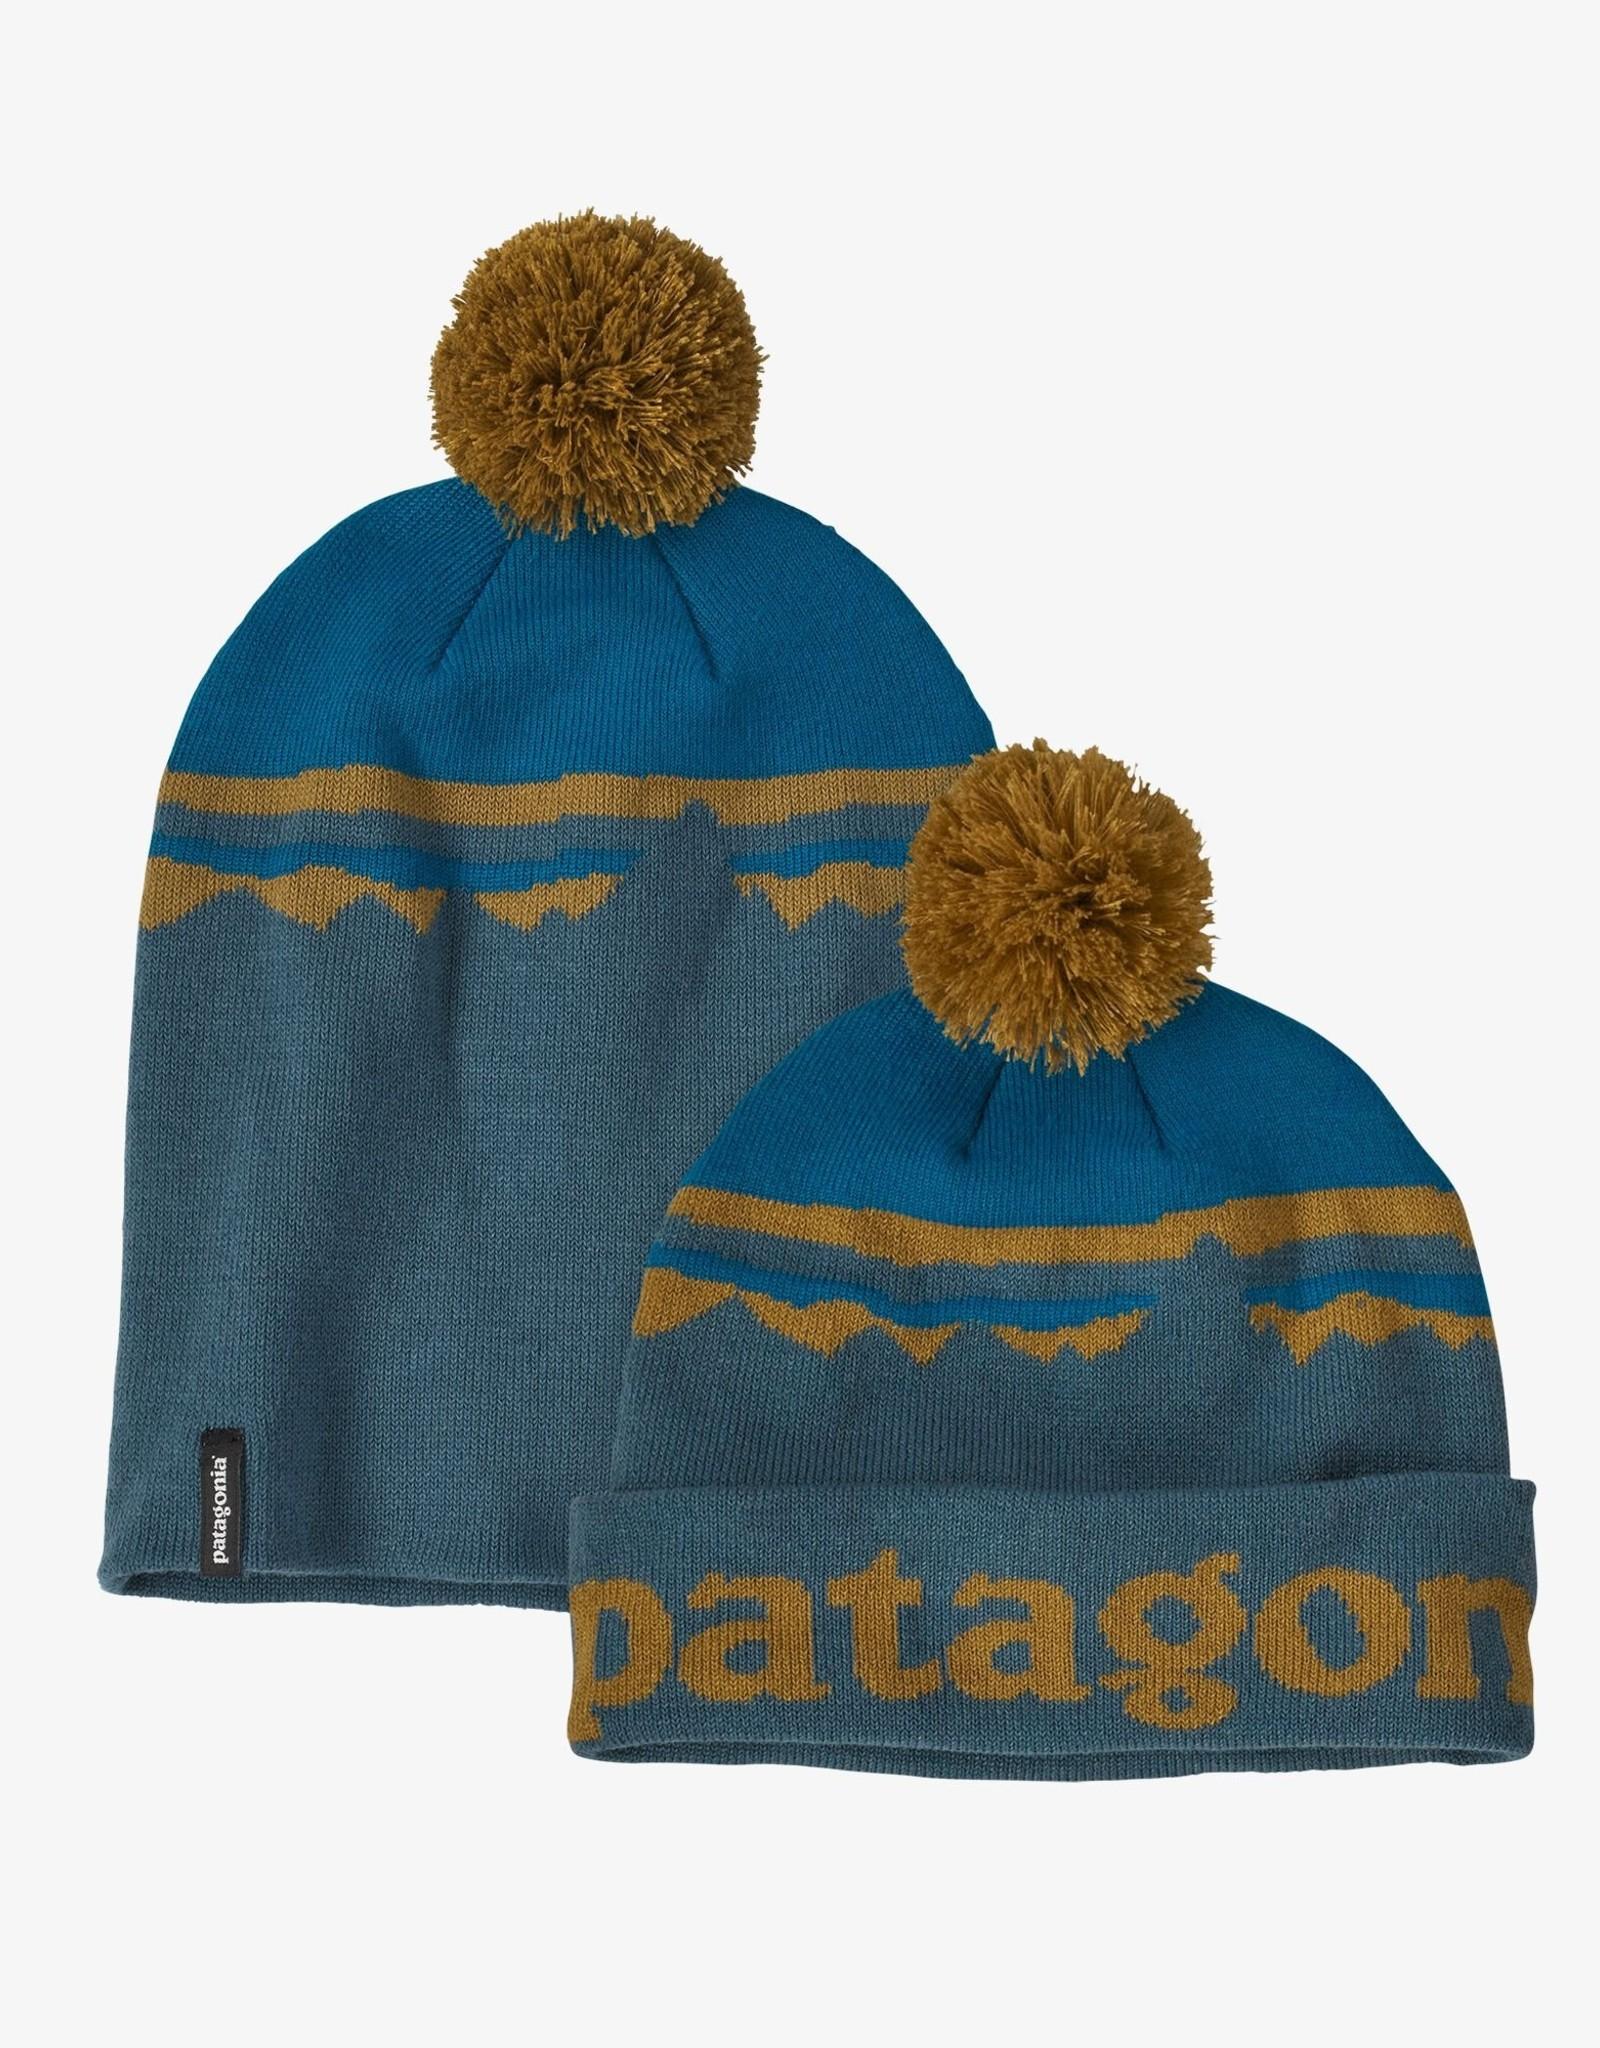 Patagonia Patagonia LW Powder Town Beanie